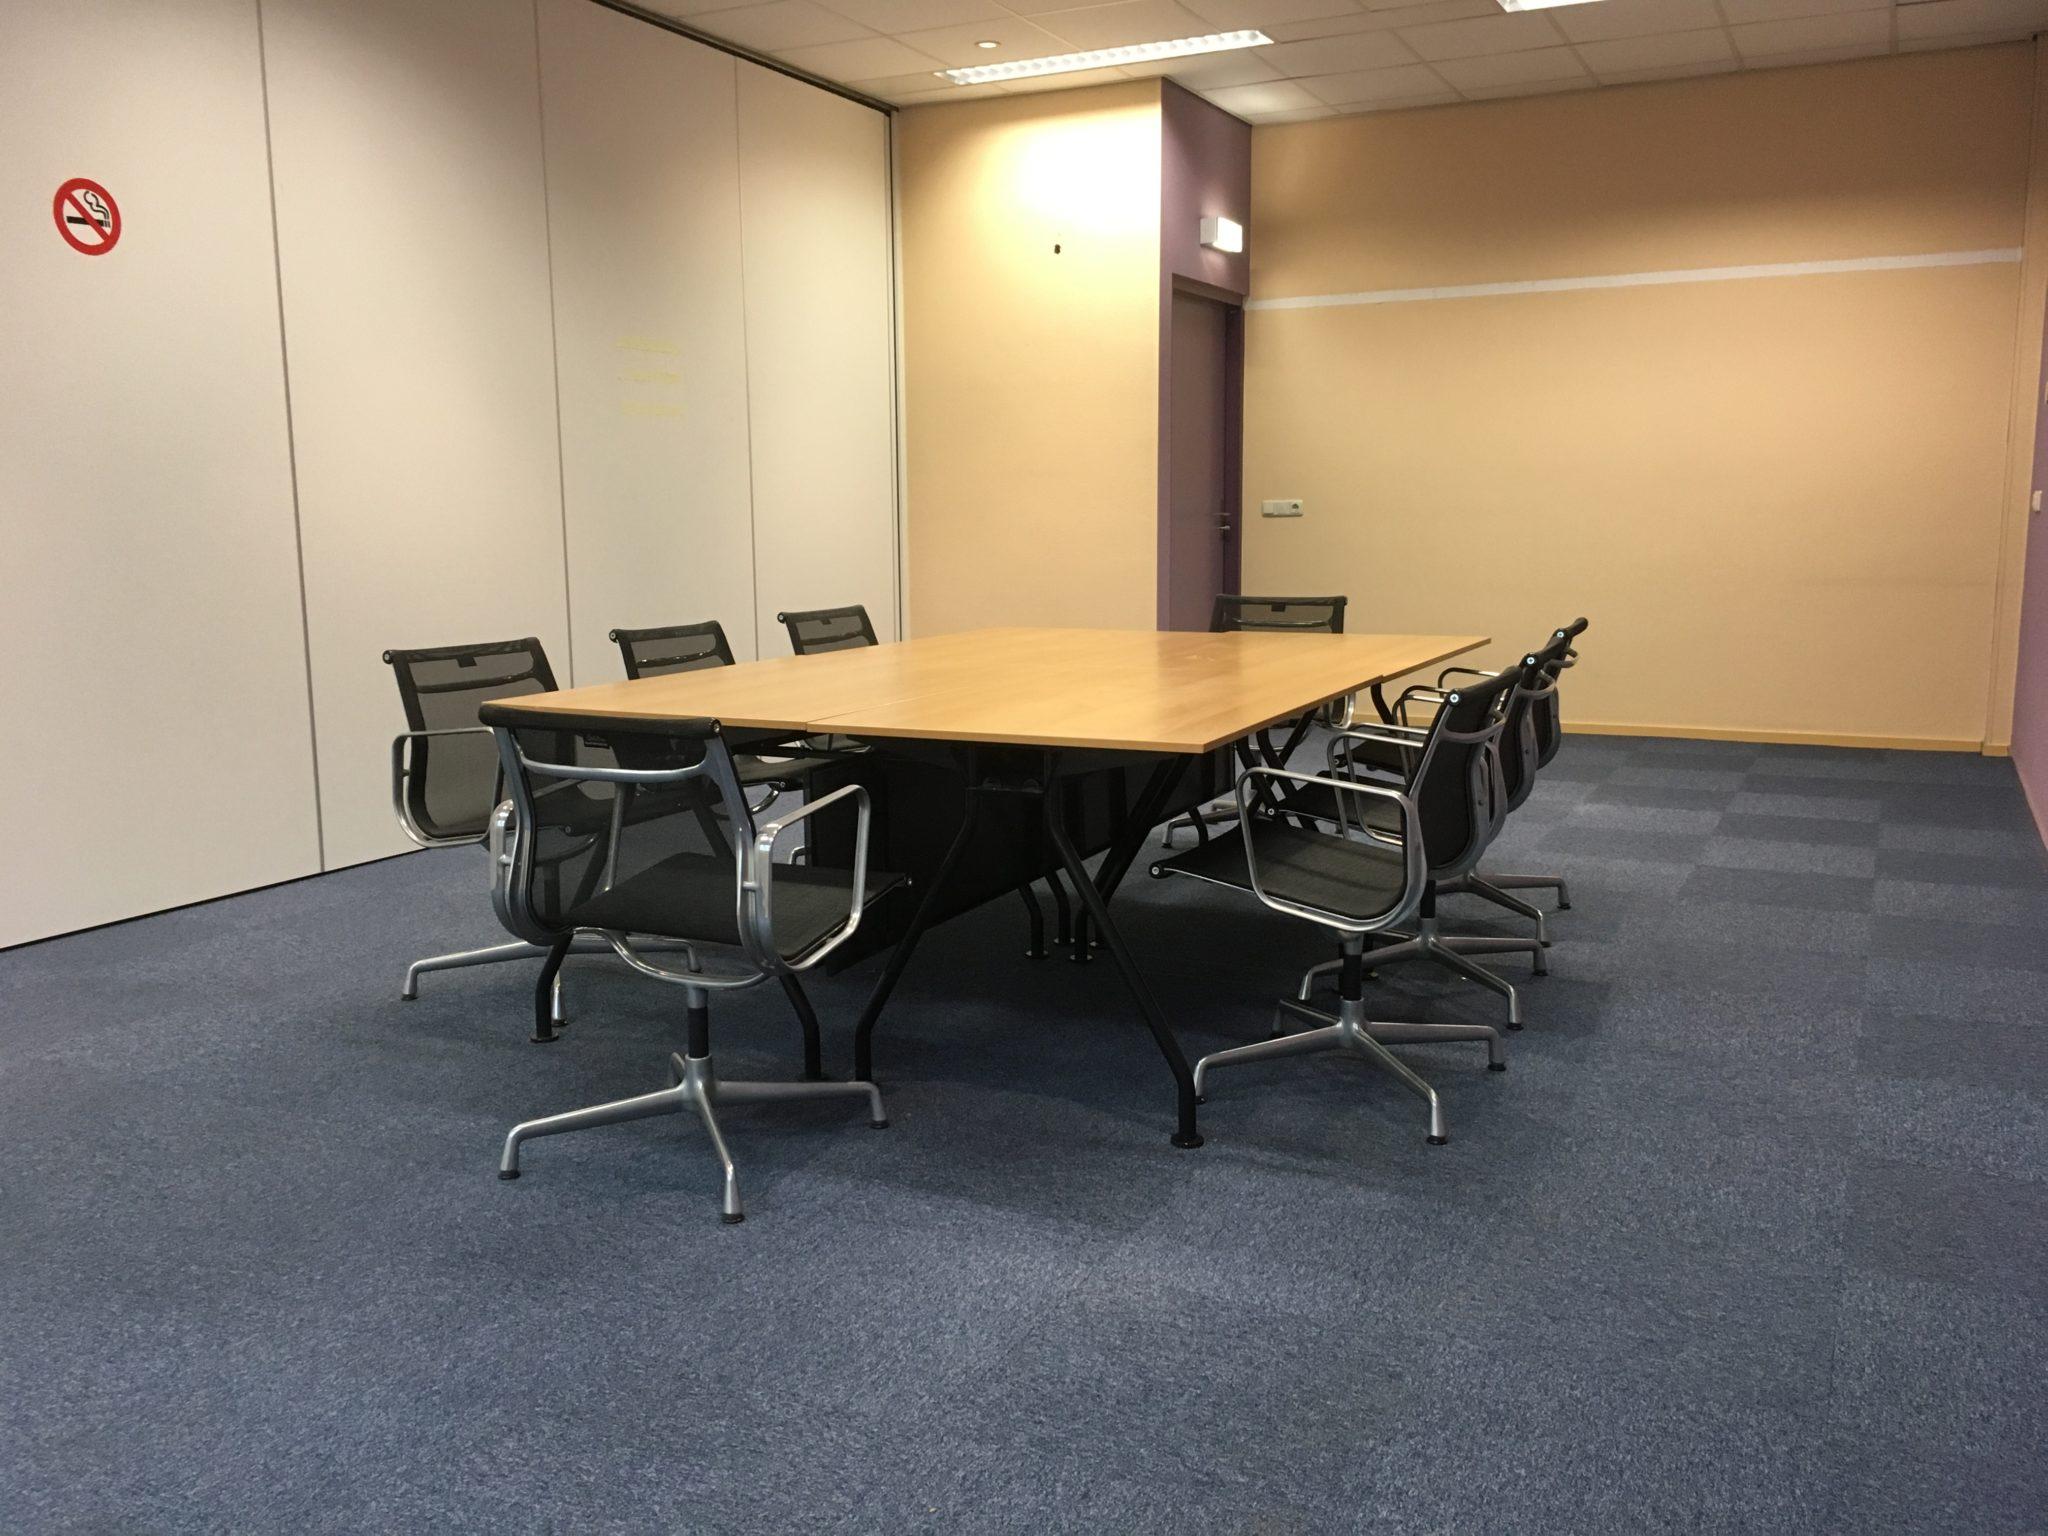 vergaderruimte-smart-city-haarlem